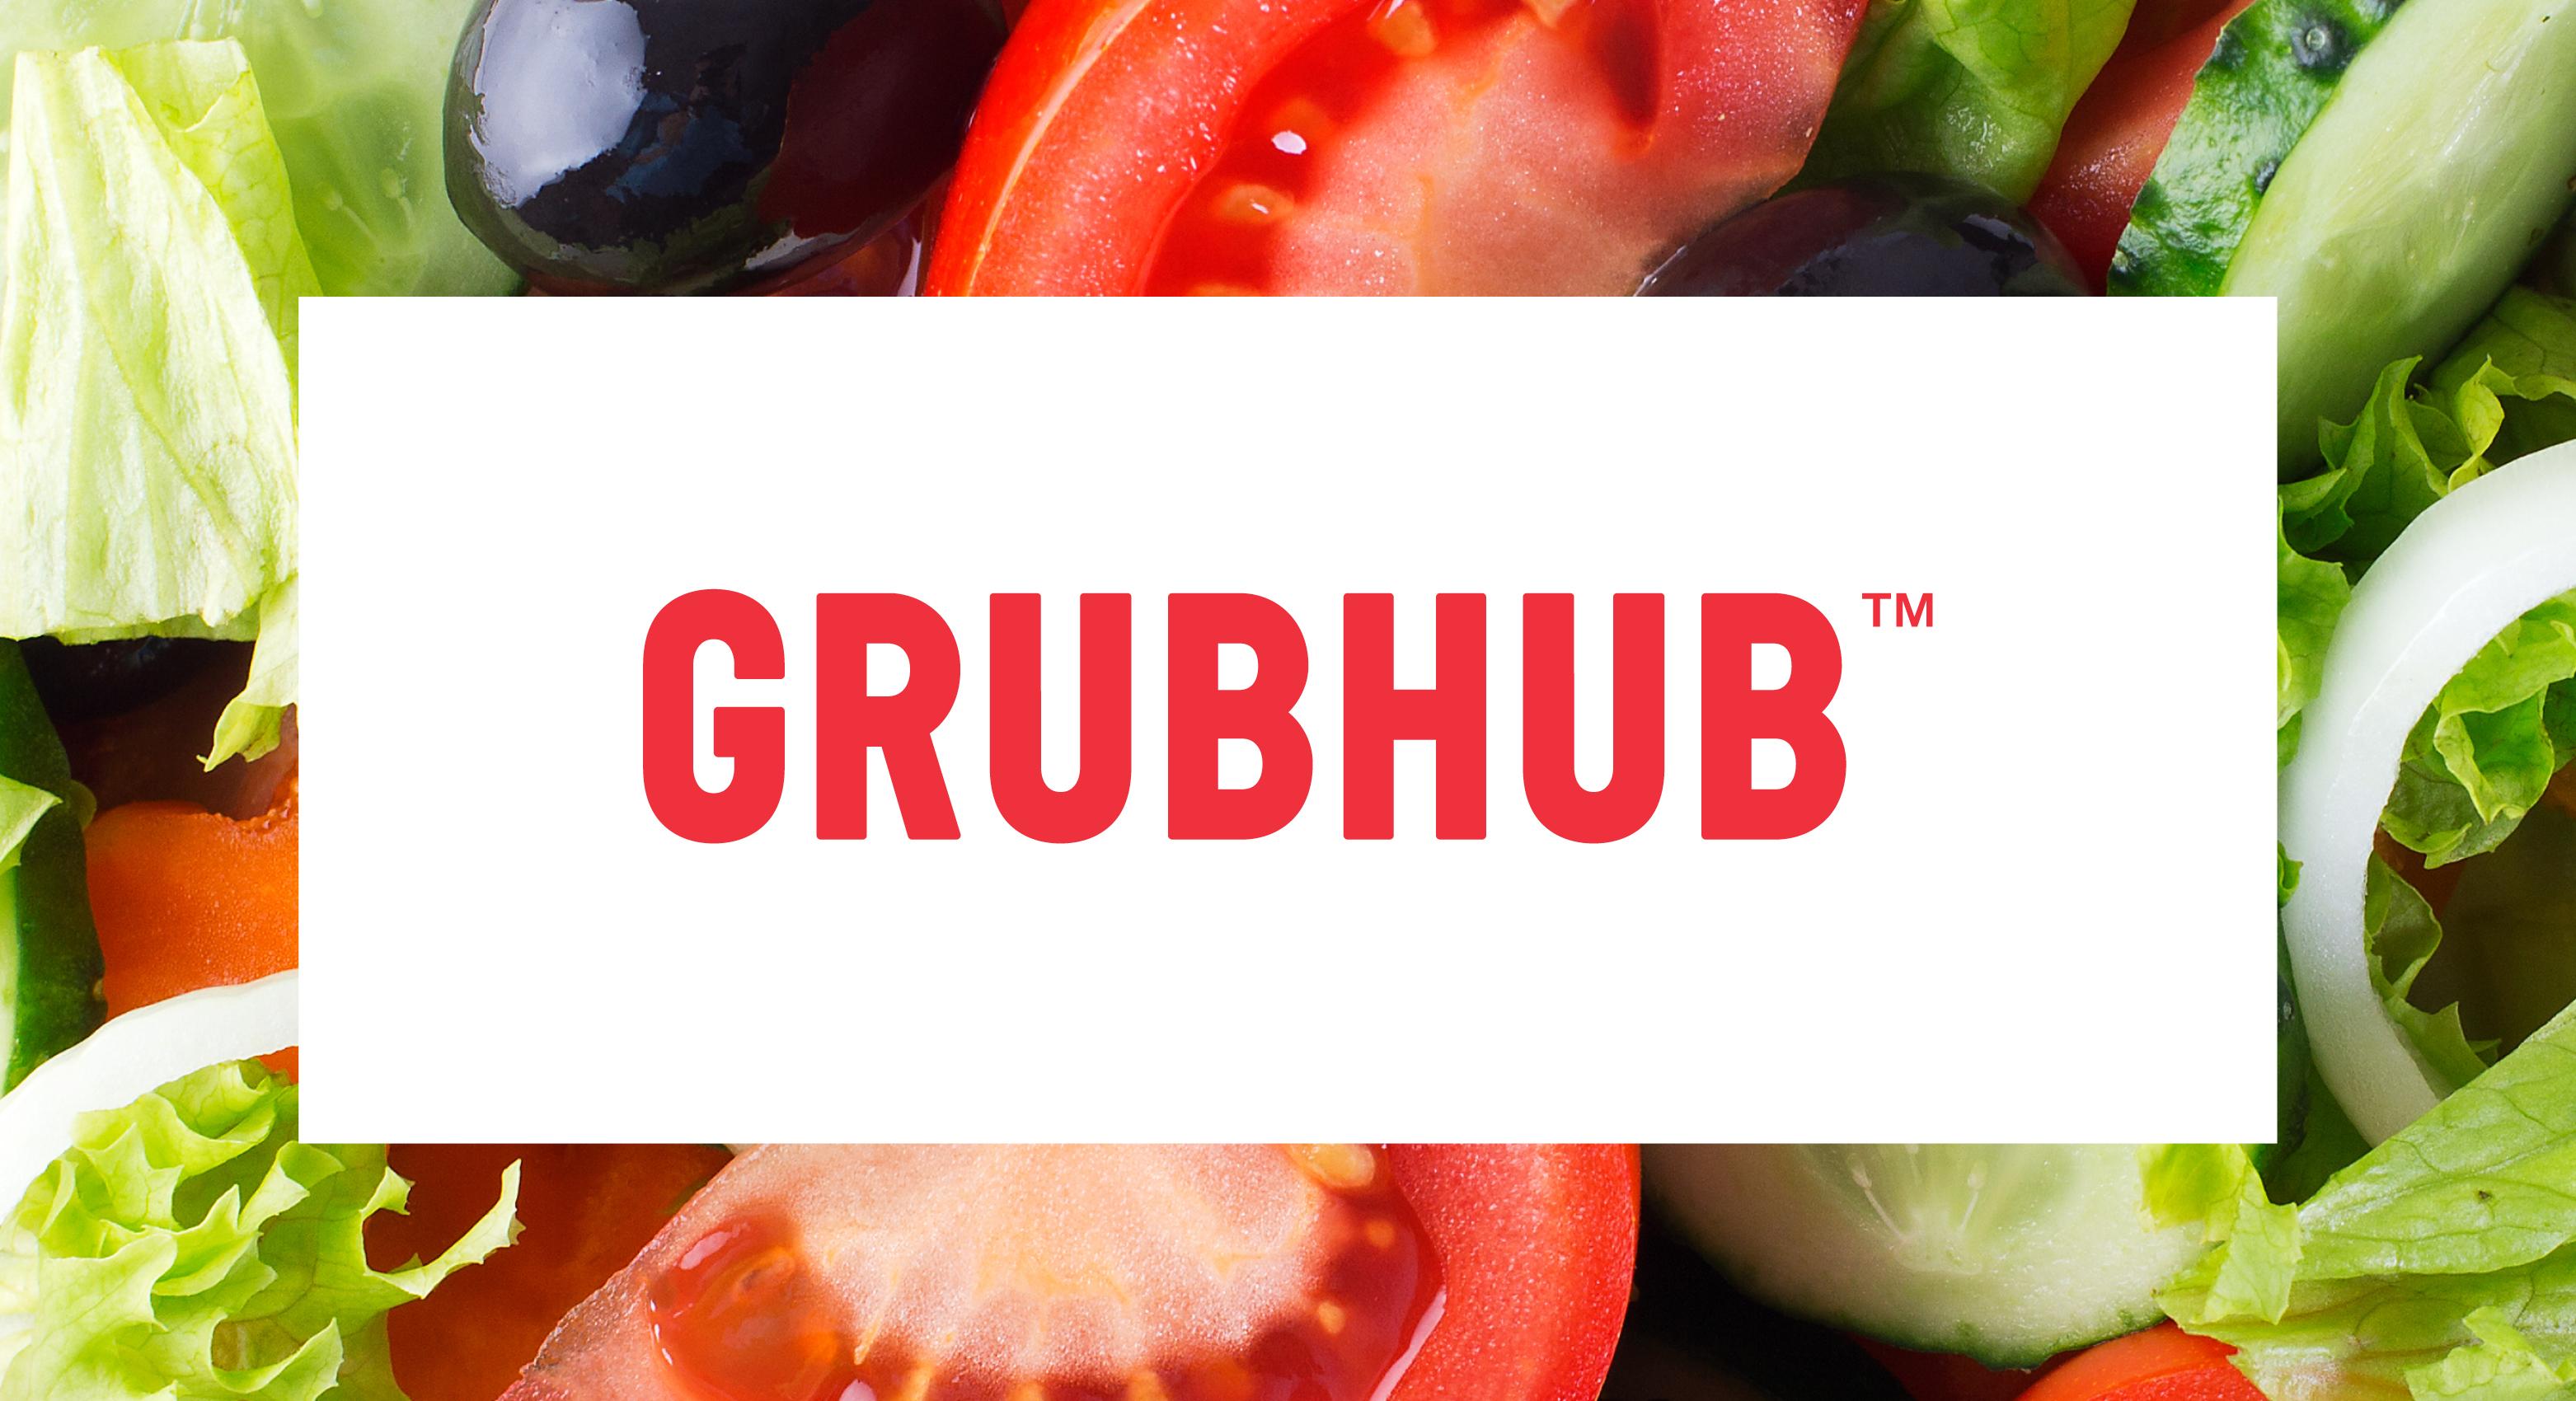 GrubhubOG_0.jpg